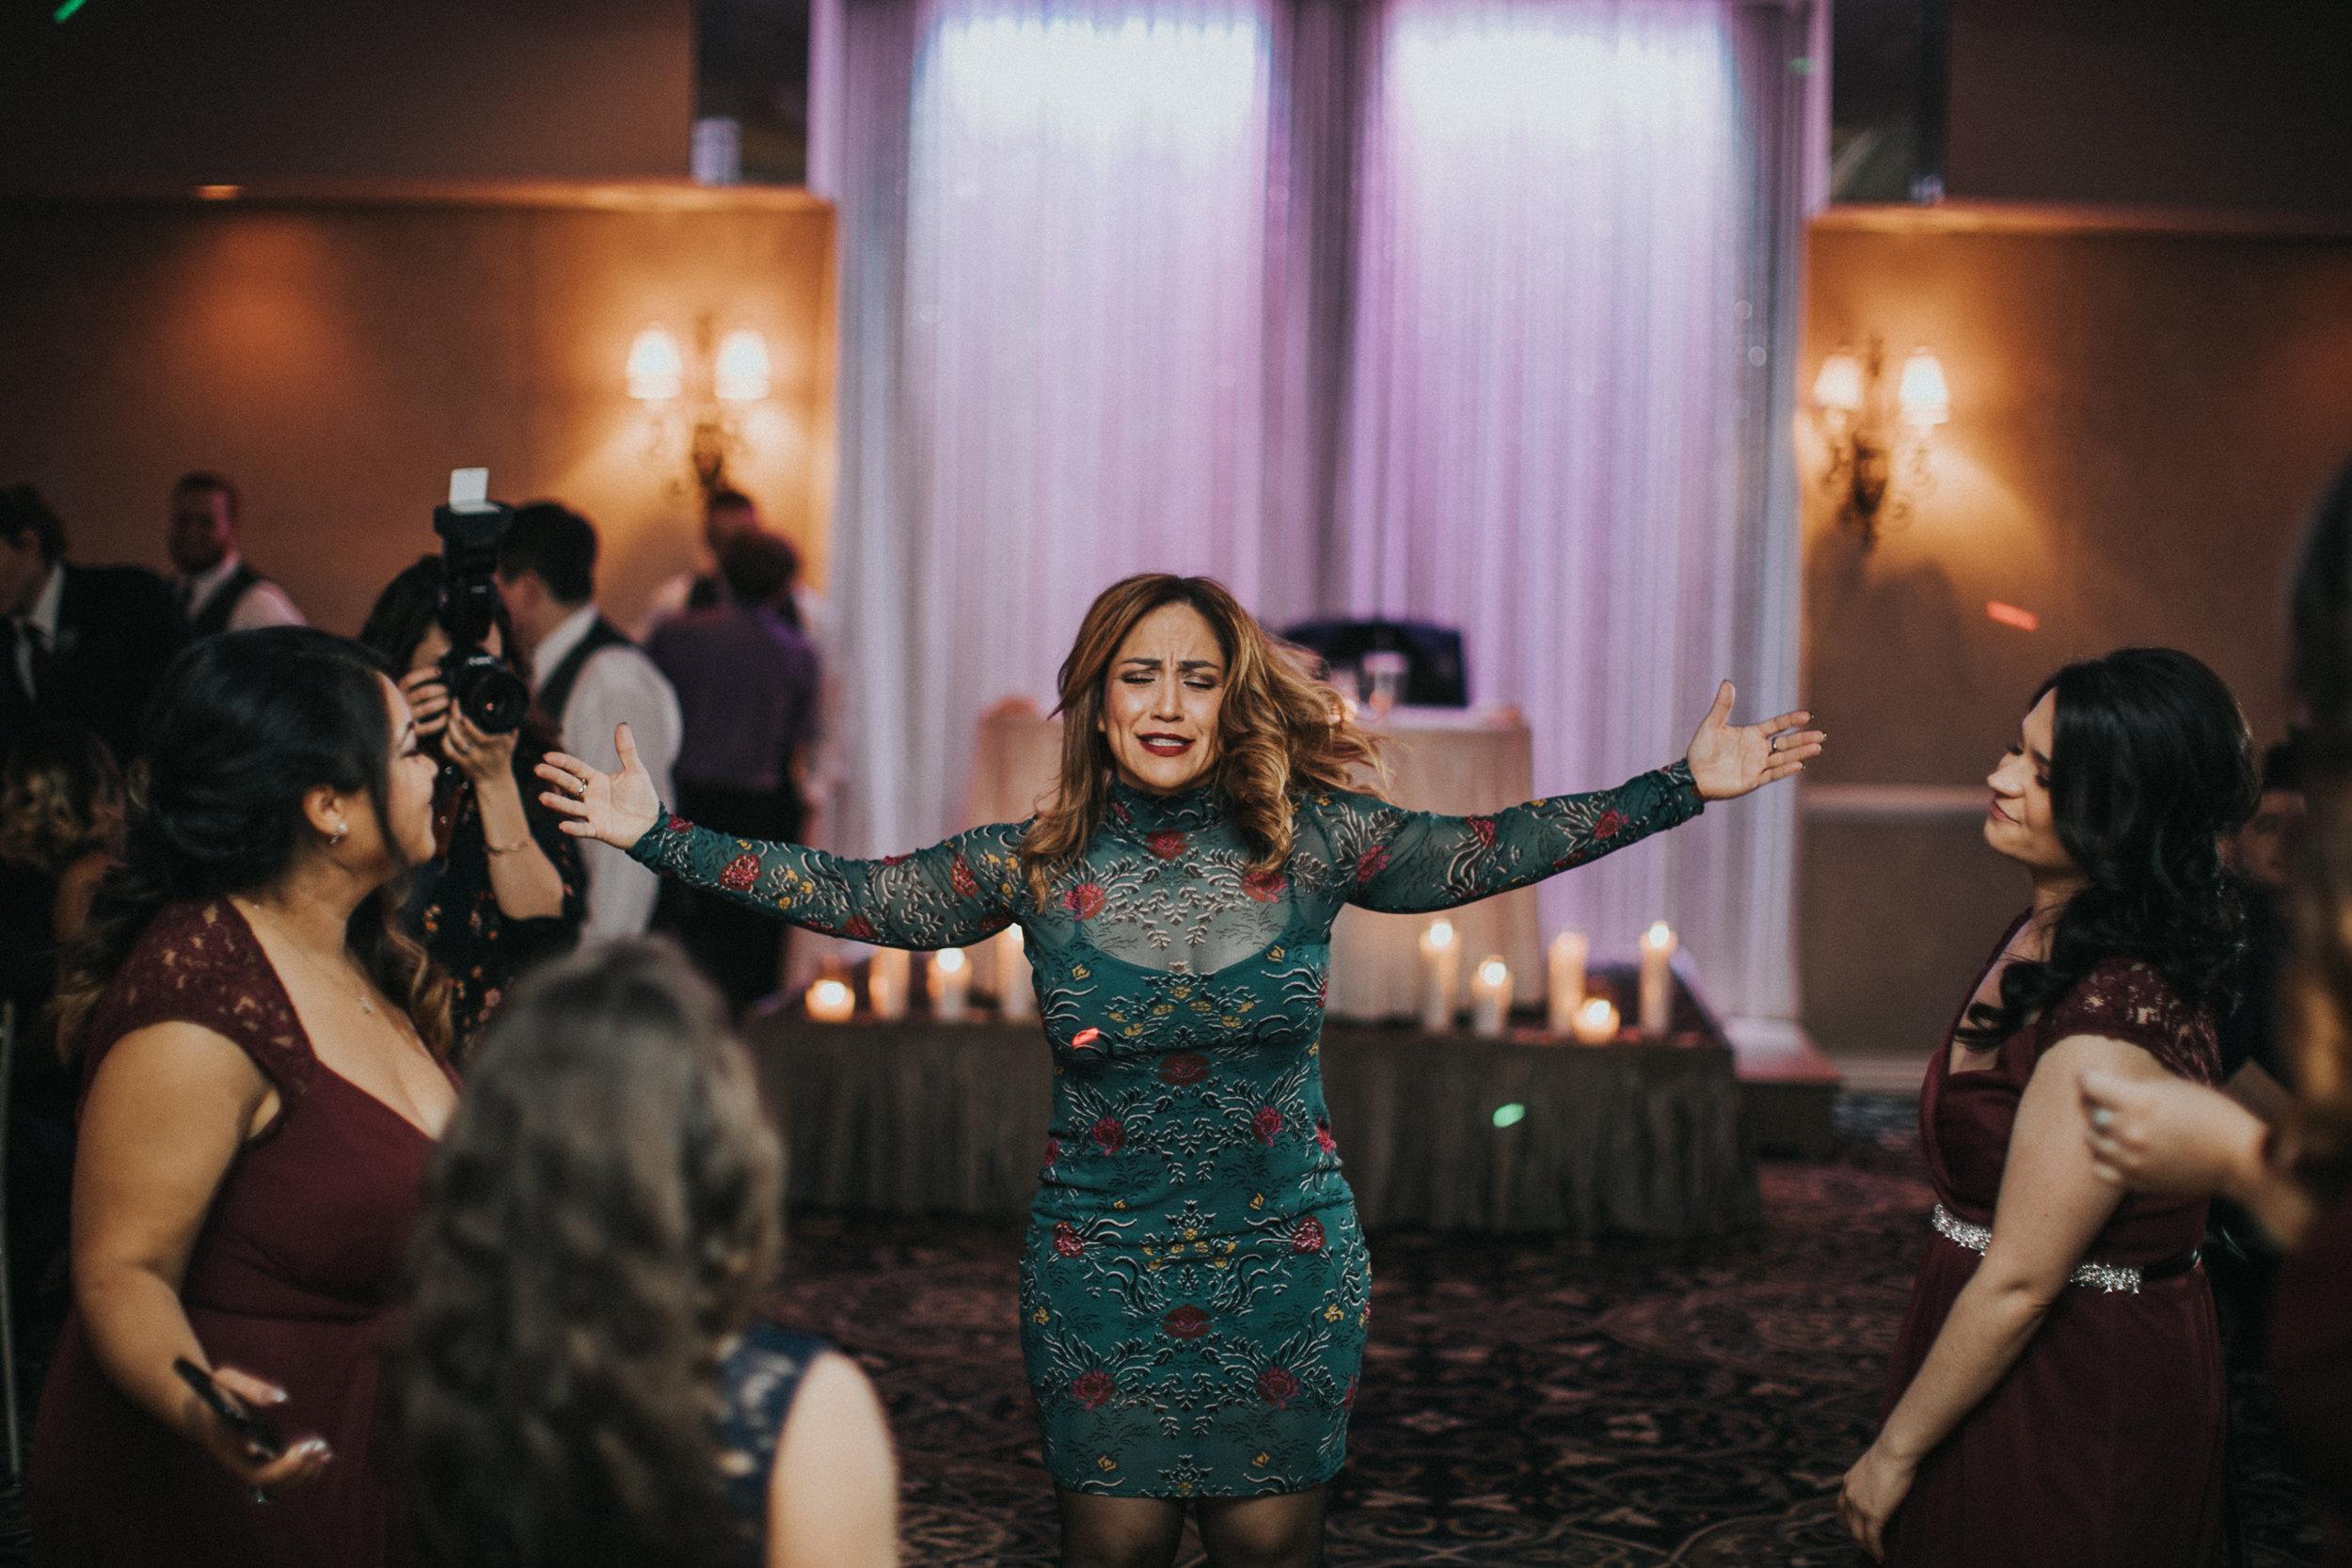 New-Jersey-Wedding-Photographer-ReceptionCenter-Valeria&Mike-Reception (127 of 265).jpg